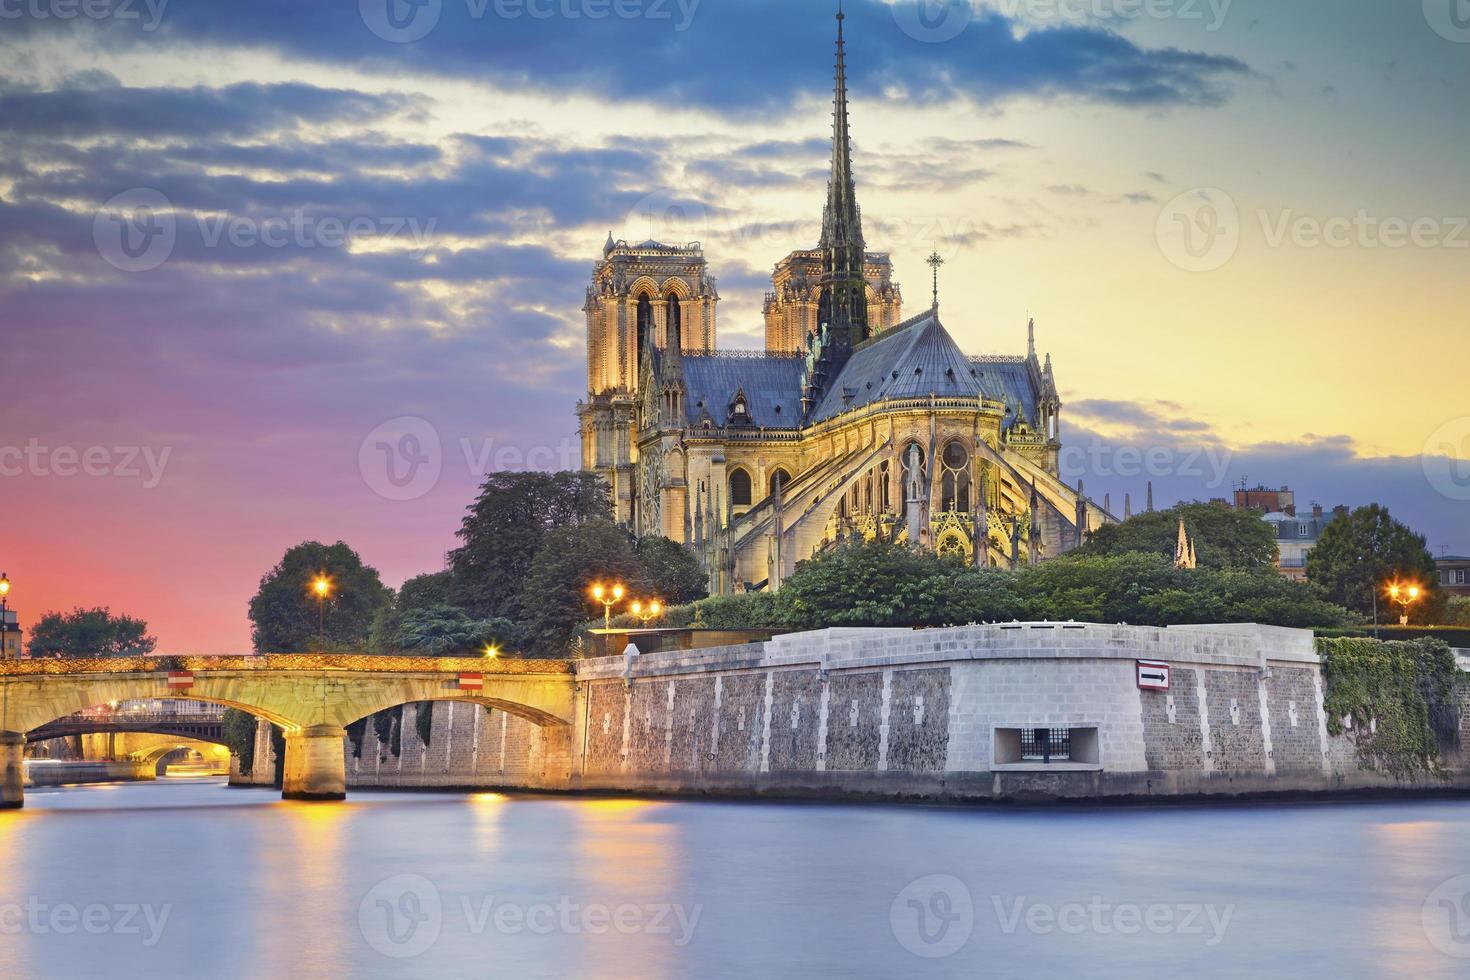 Notre Dame kathedraal, Parijs. foto